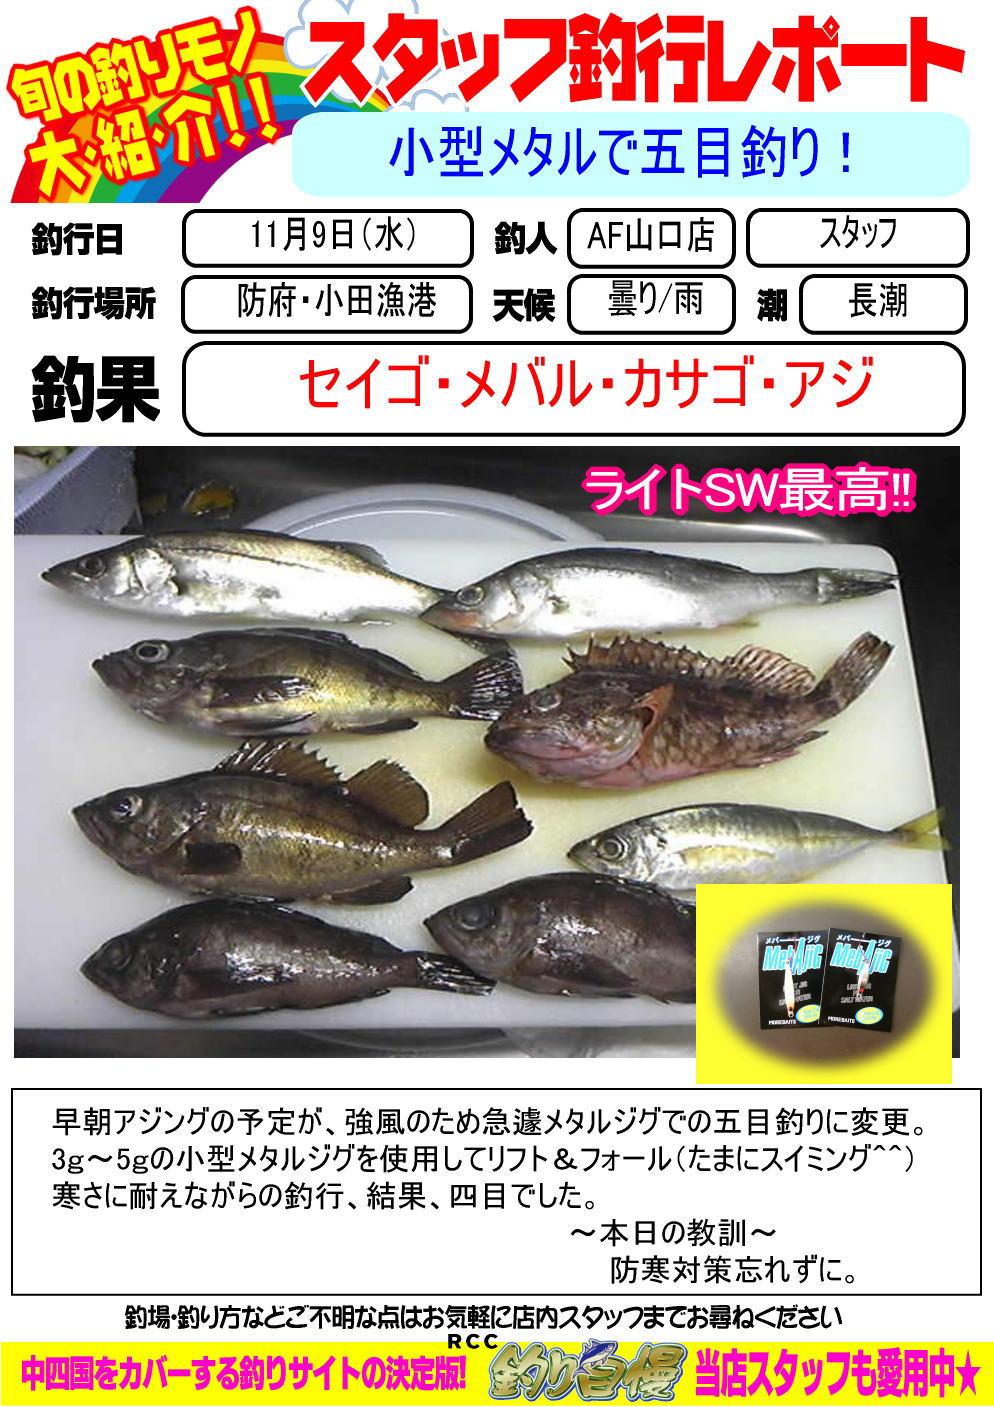 http://www.e-angle.co.jp/shop/blog/blog-20161109-yamaguchi-gomoku.jpg